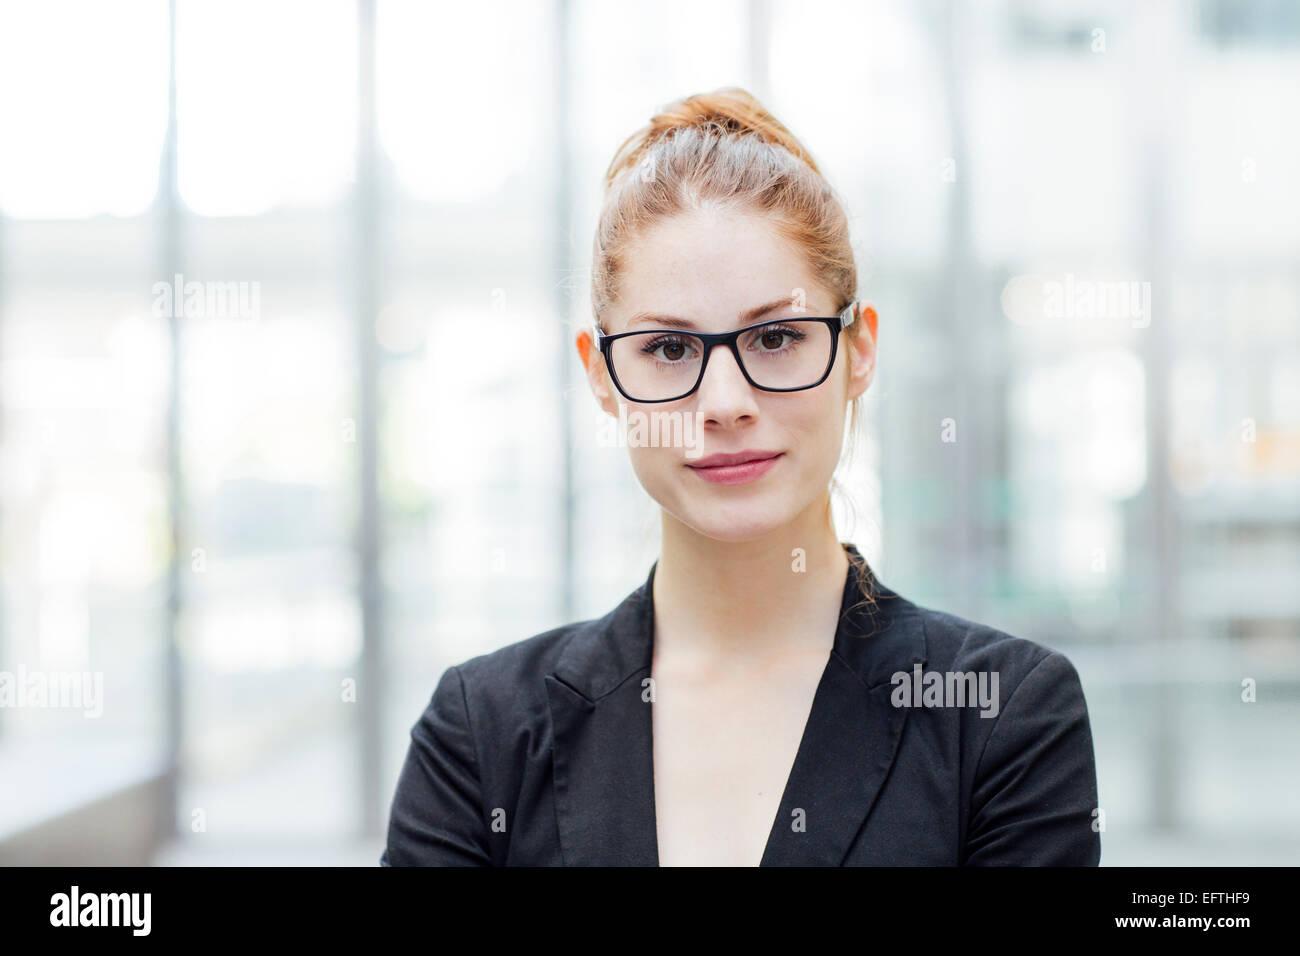 Portrait of businesswoman - Stock Image